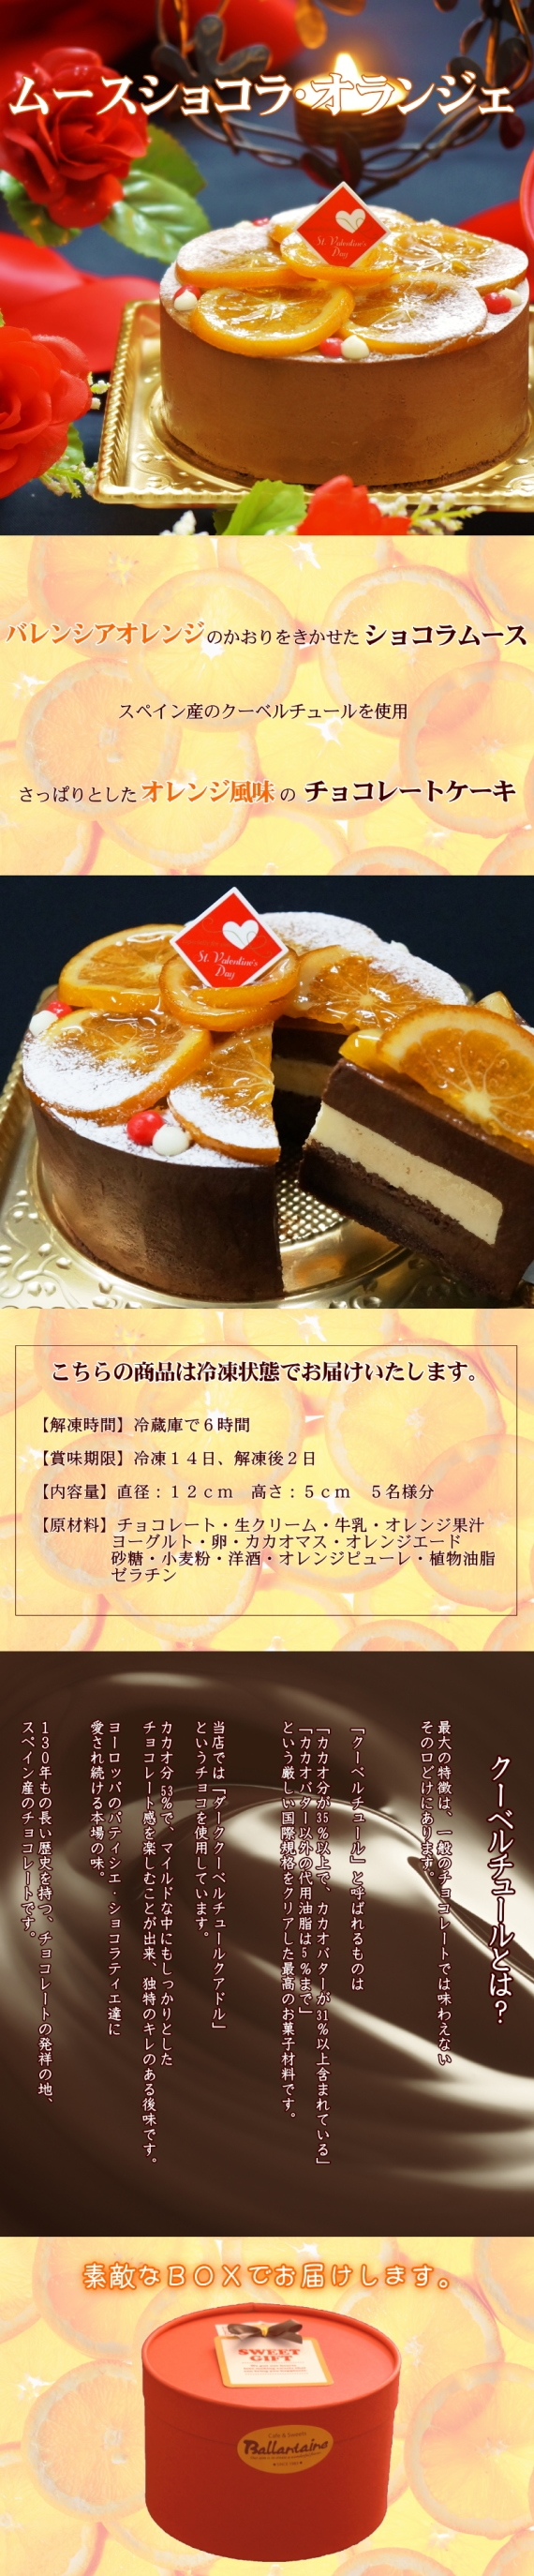 <47CLUB> ☆ムースショコラ・オランジェ☆(4〜5人分)【2018お中元】【スイーツ・洋菓子】画像